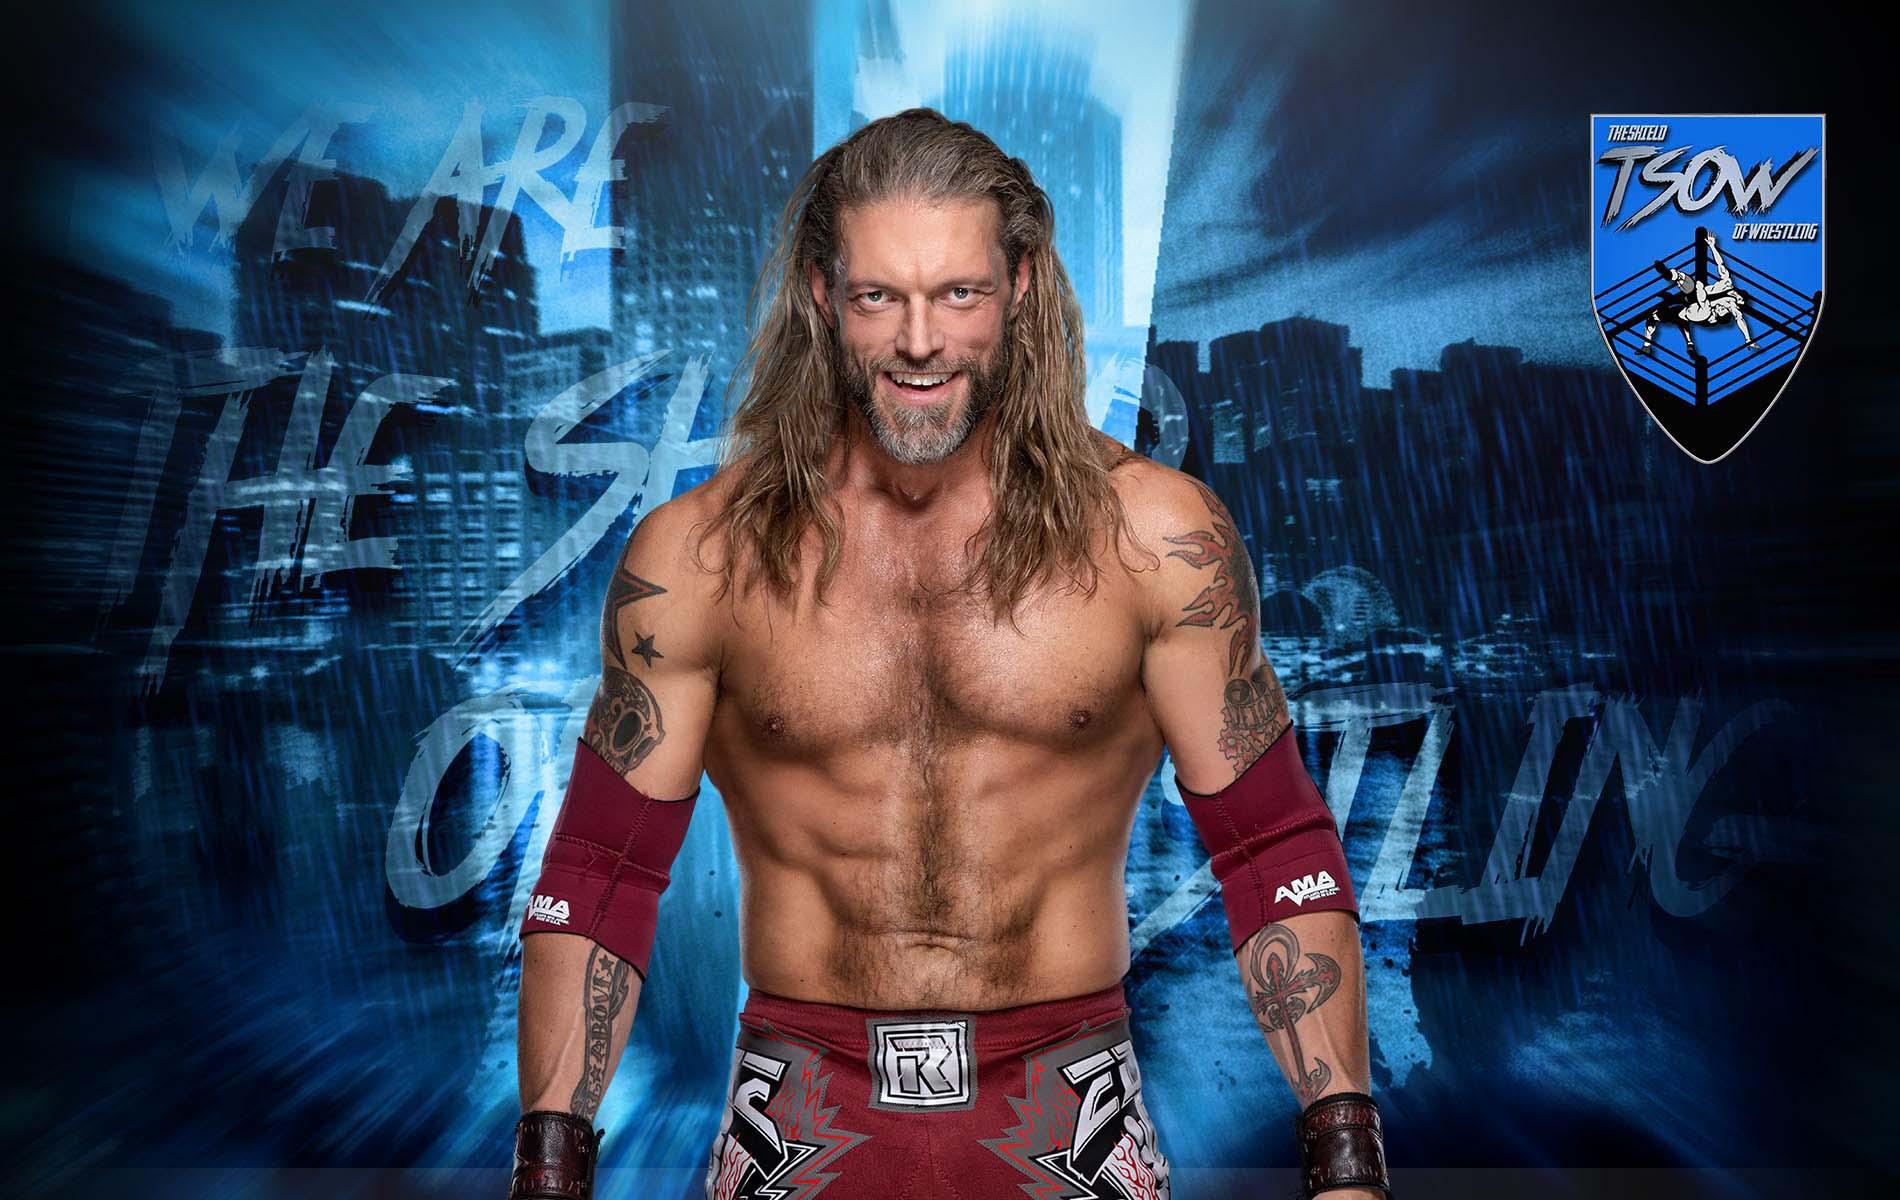 Edge vuole affrontare Daniel Bryan in un Iron Man match